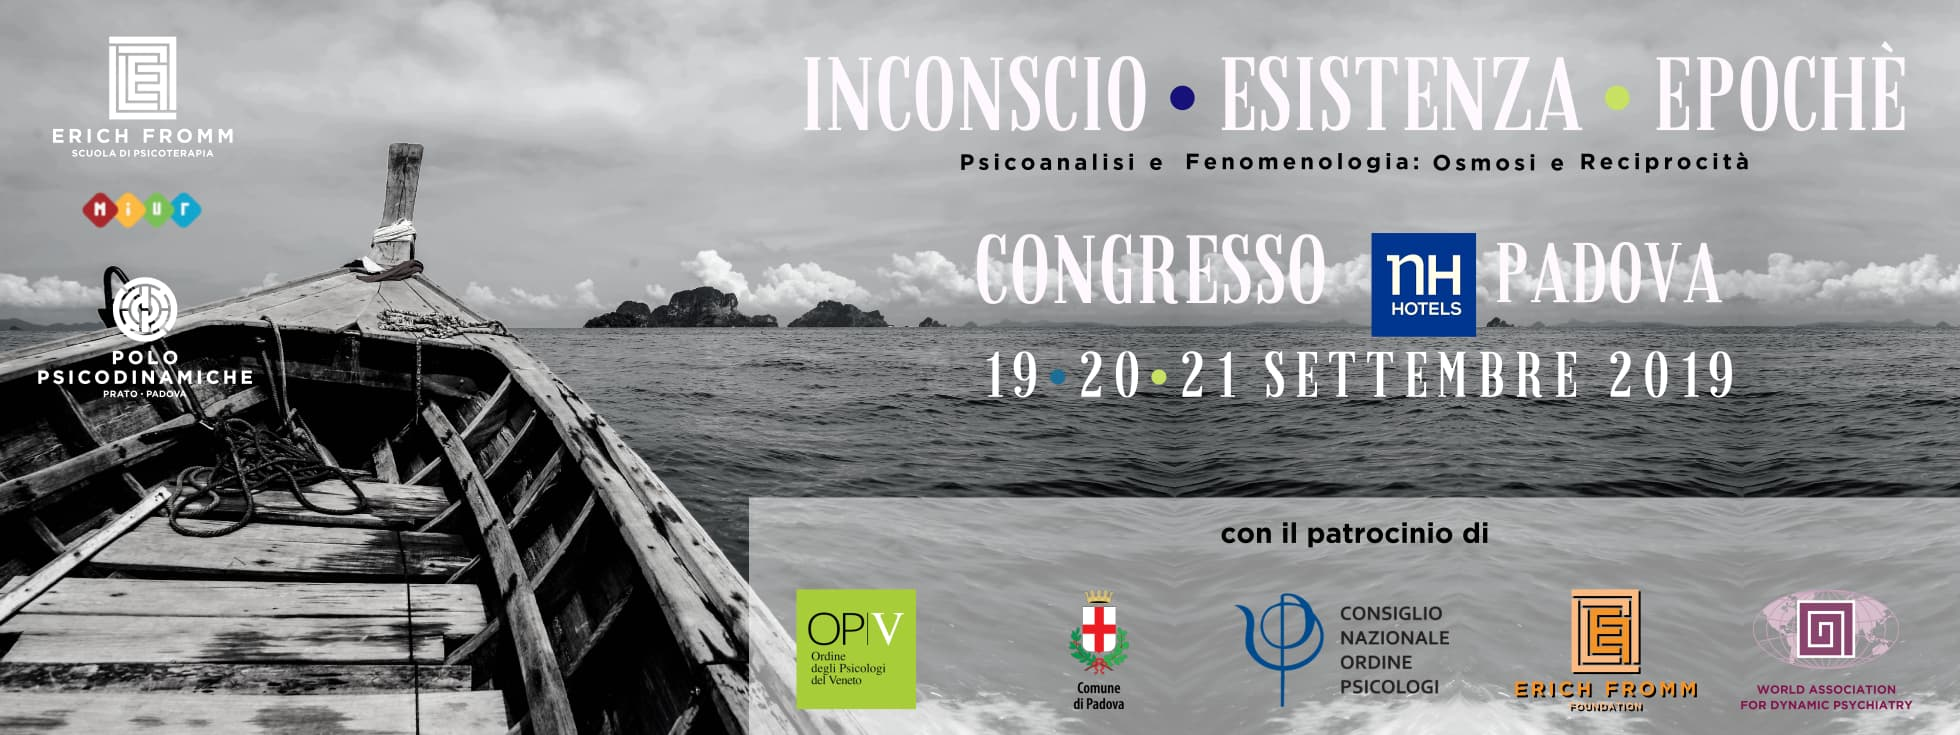 Congresso SPEF 2019 Padova